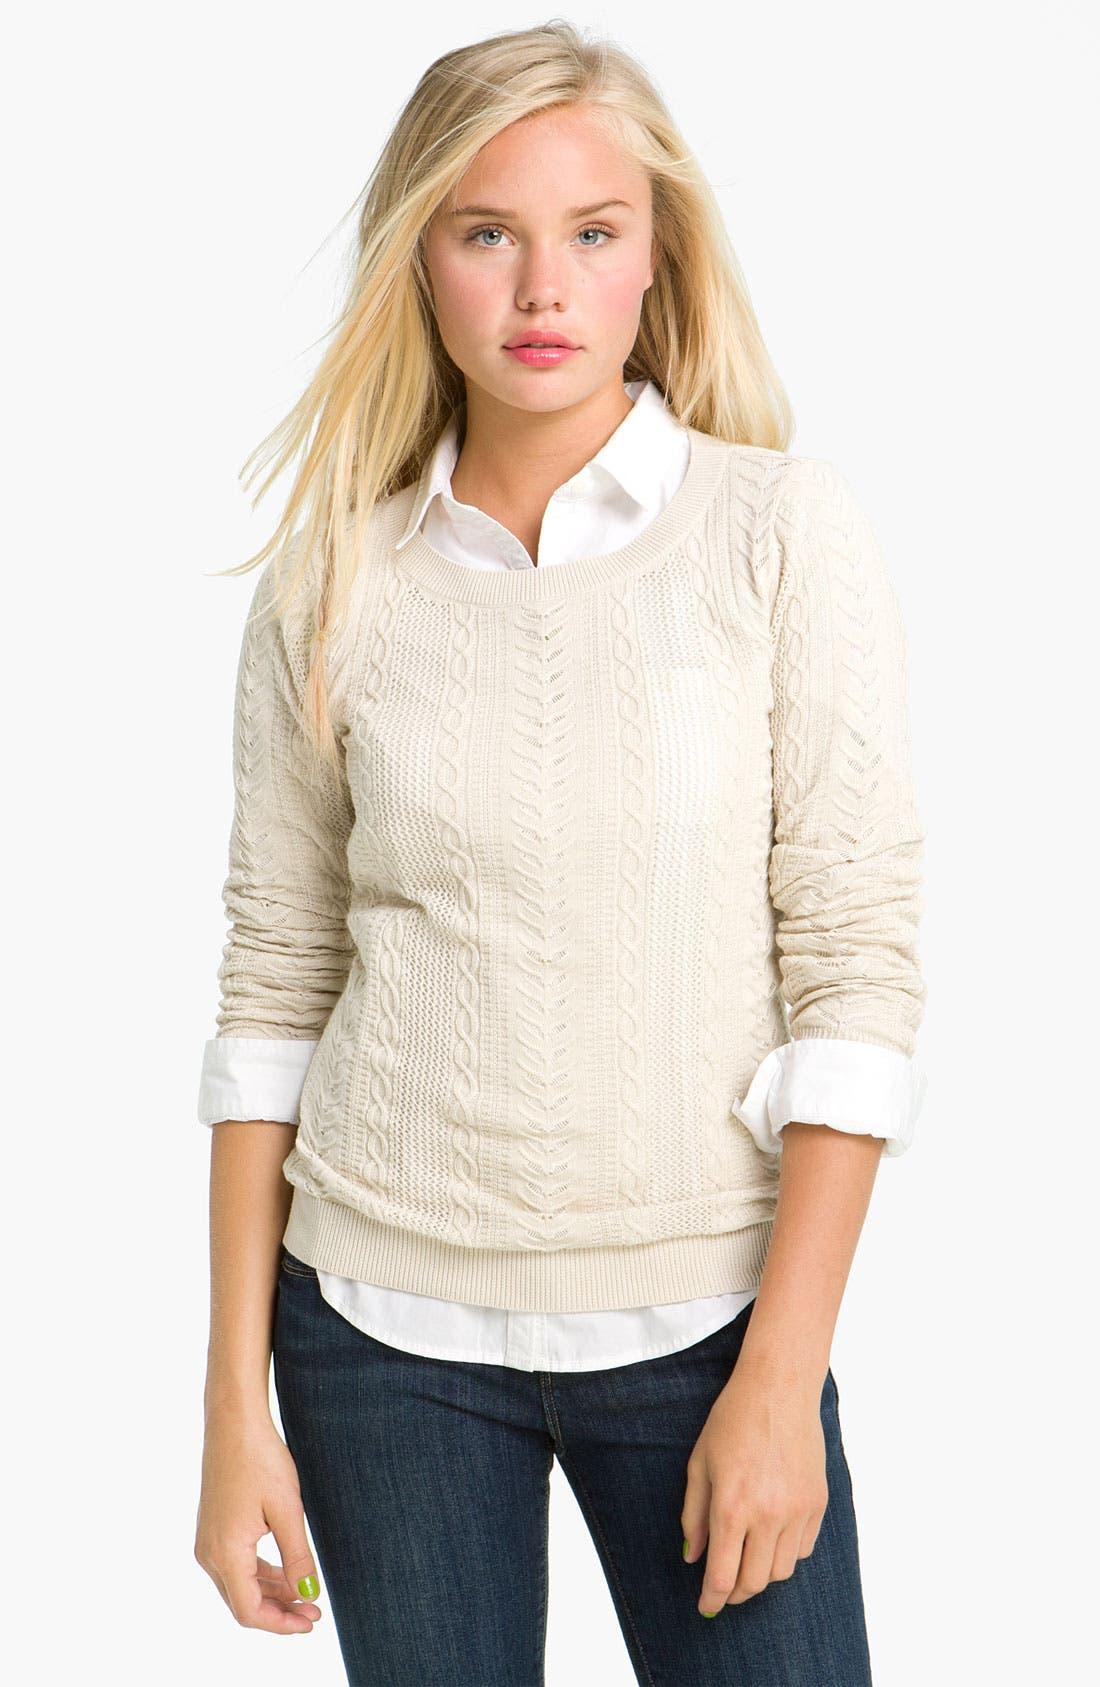 Alternate Image 1 Selected - BP. Sheer Cable Knit Sweater (Juniors)